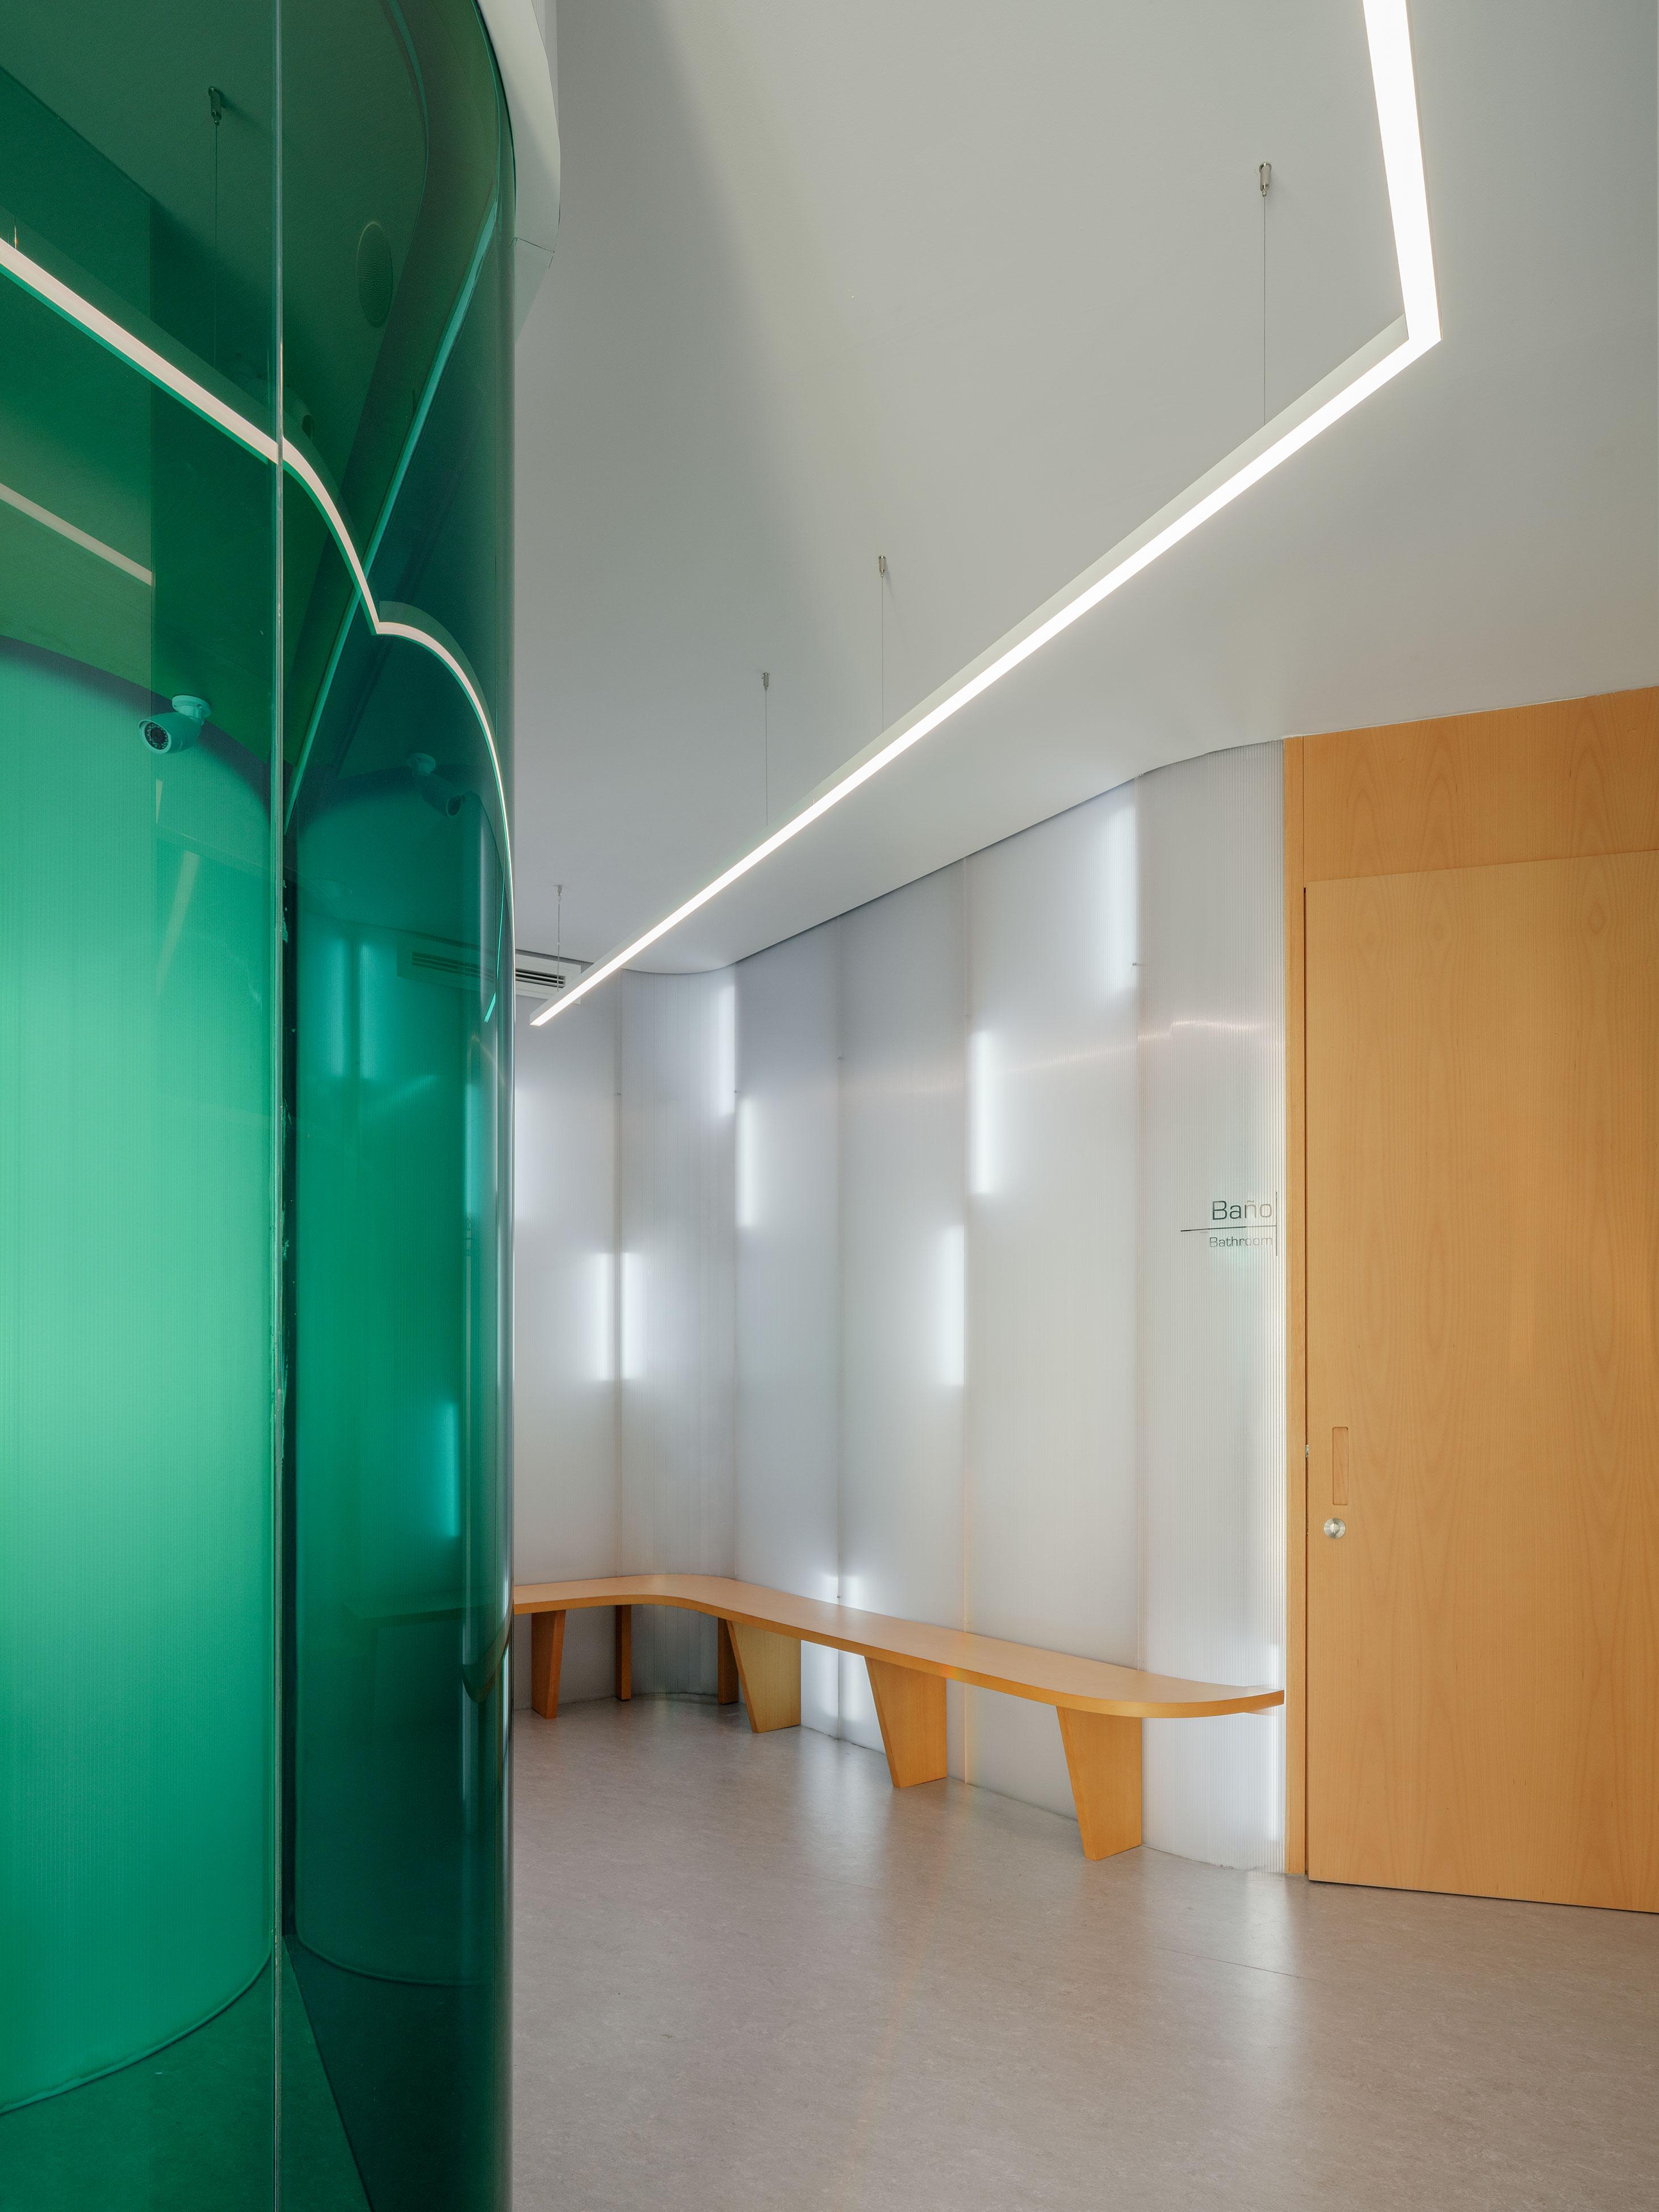 Clinica_Estrems_by_Raum_4142_foto_Luis_Diaz_Diaz_08cut